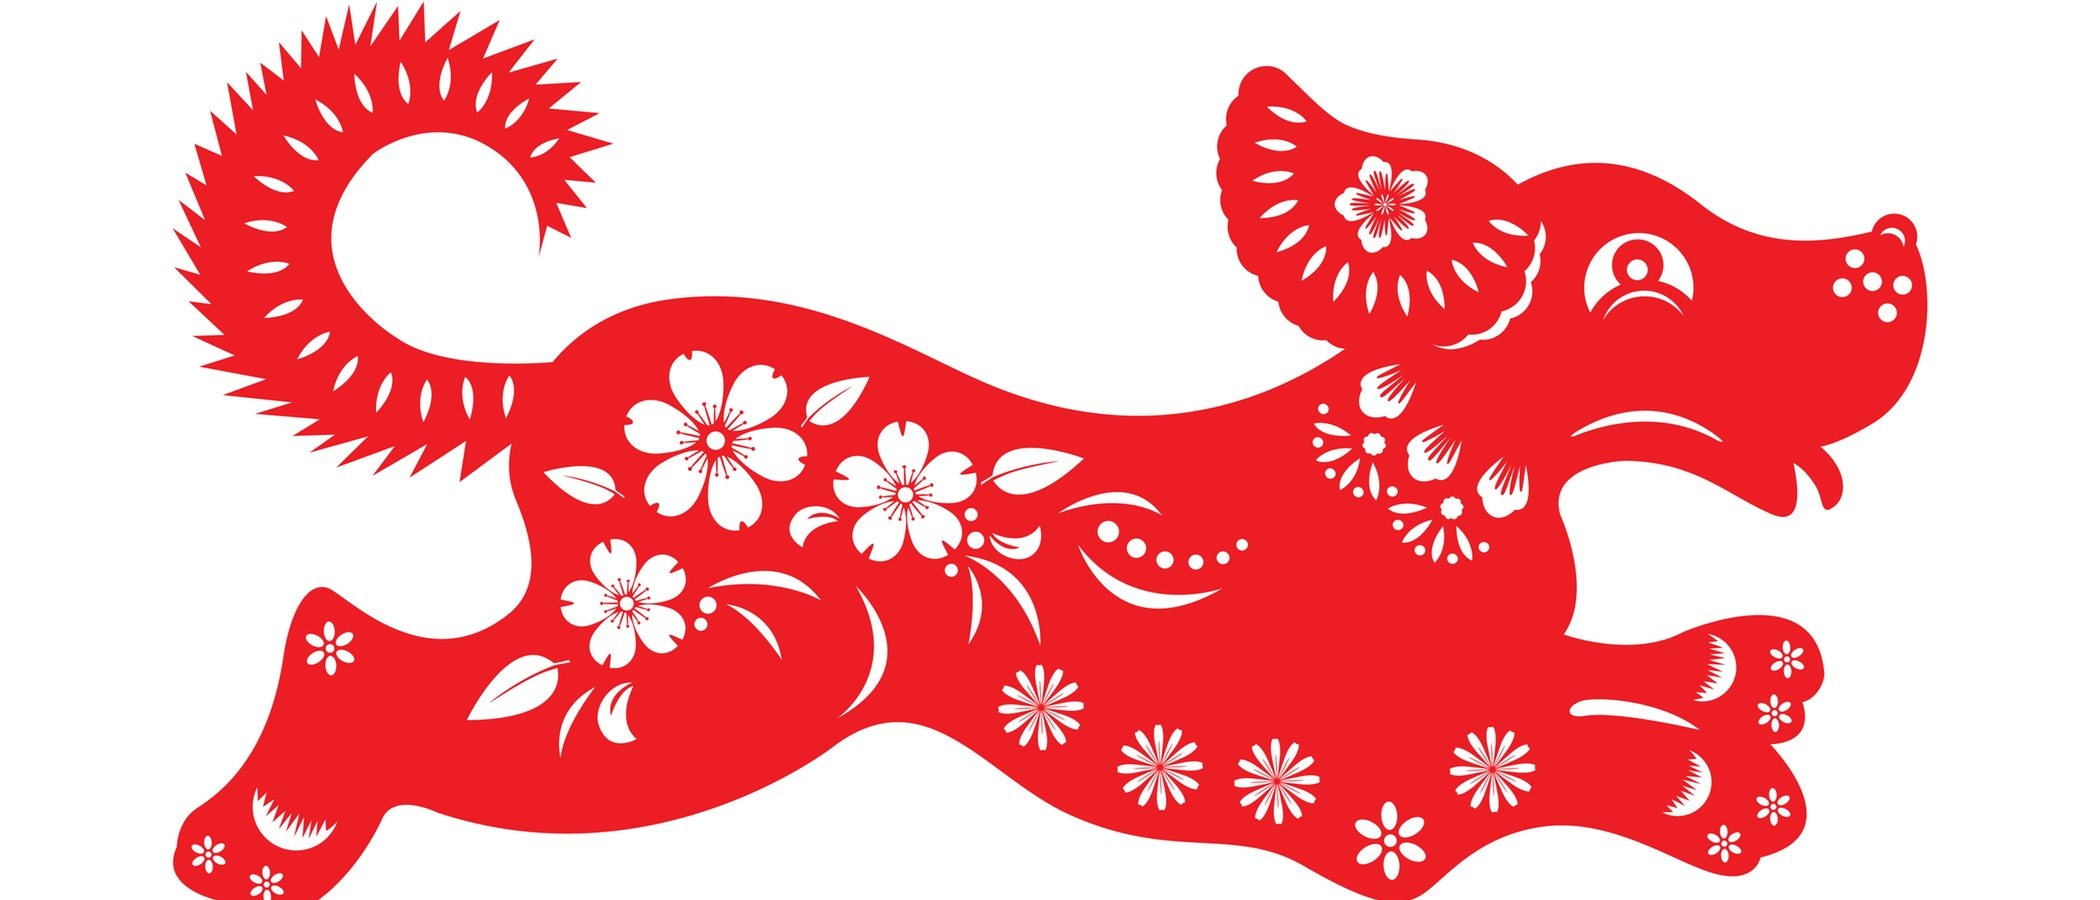 Horóscopo chino 2019: Perro